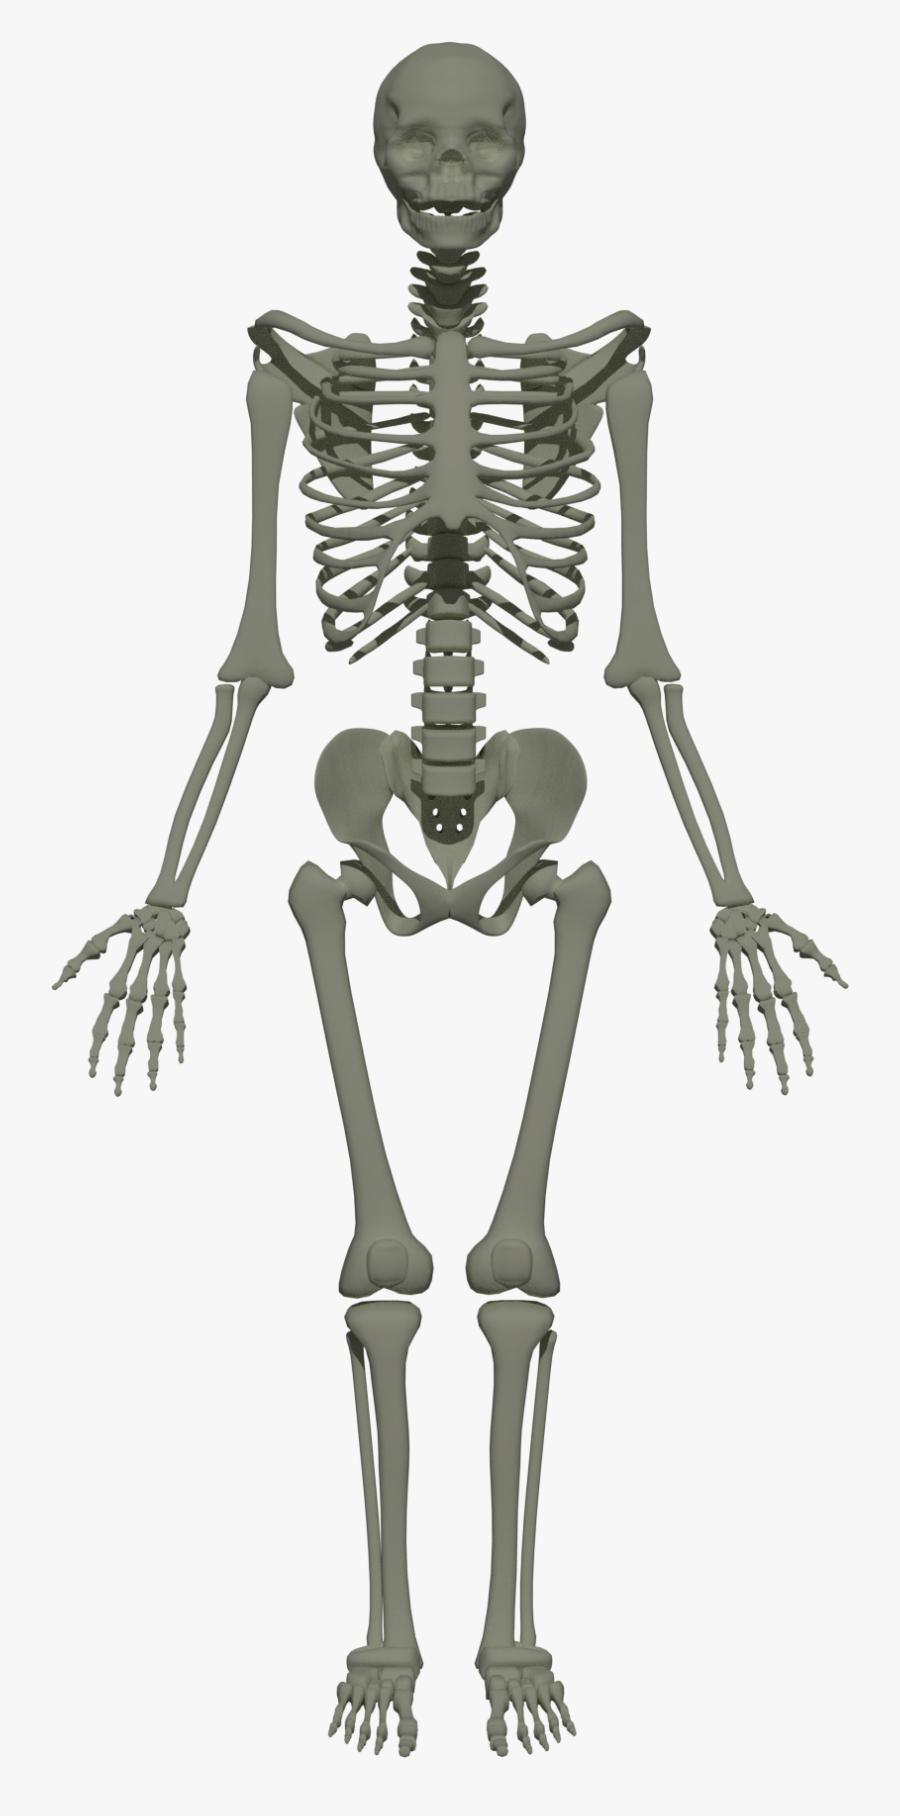 201805 Human Skeleton - Axial Skeleton Skull Thoracic Cage Vertebral, Transparent Clipart